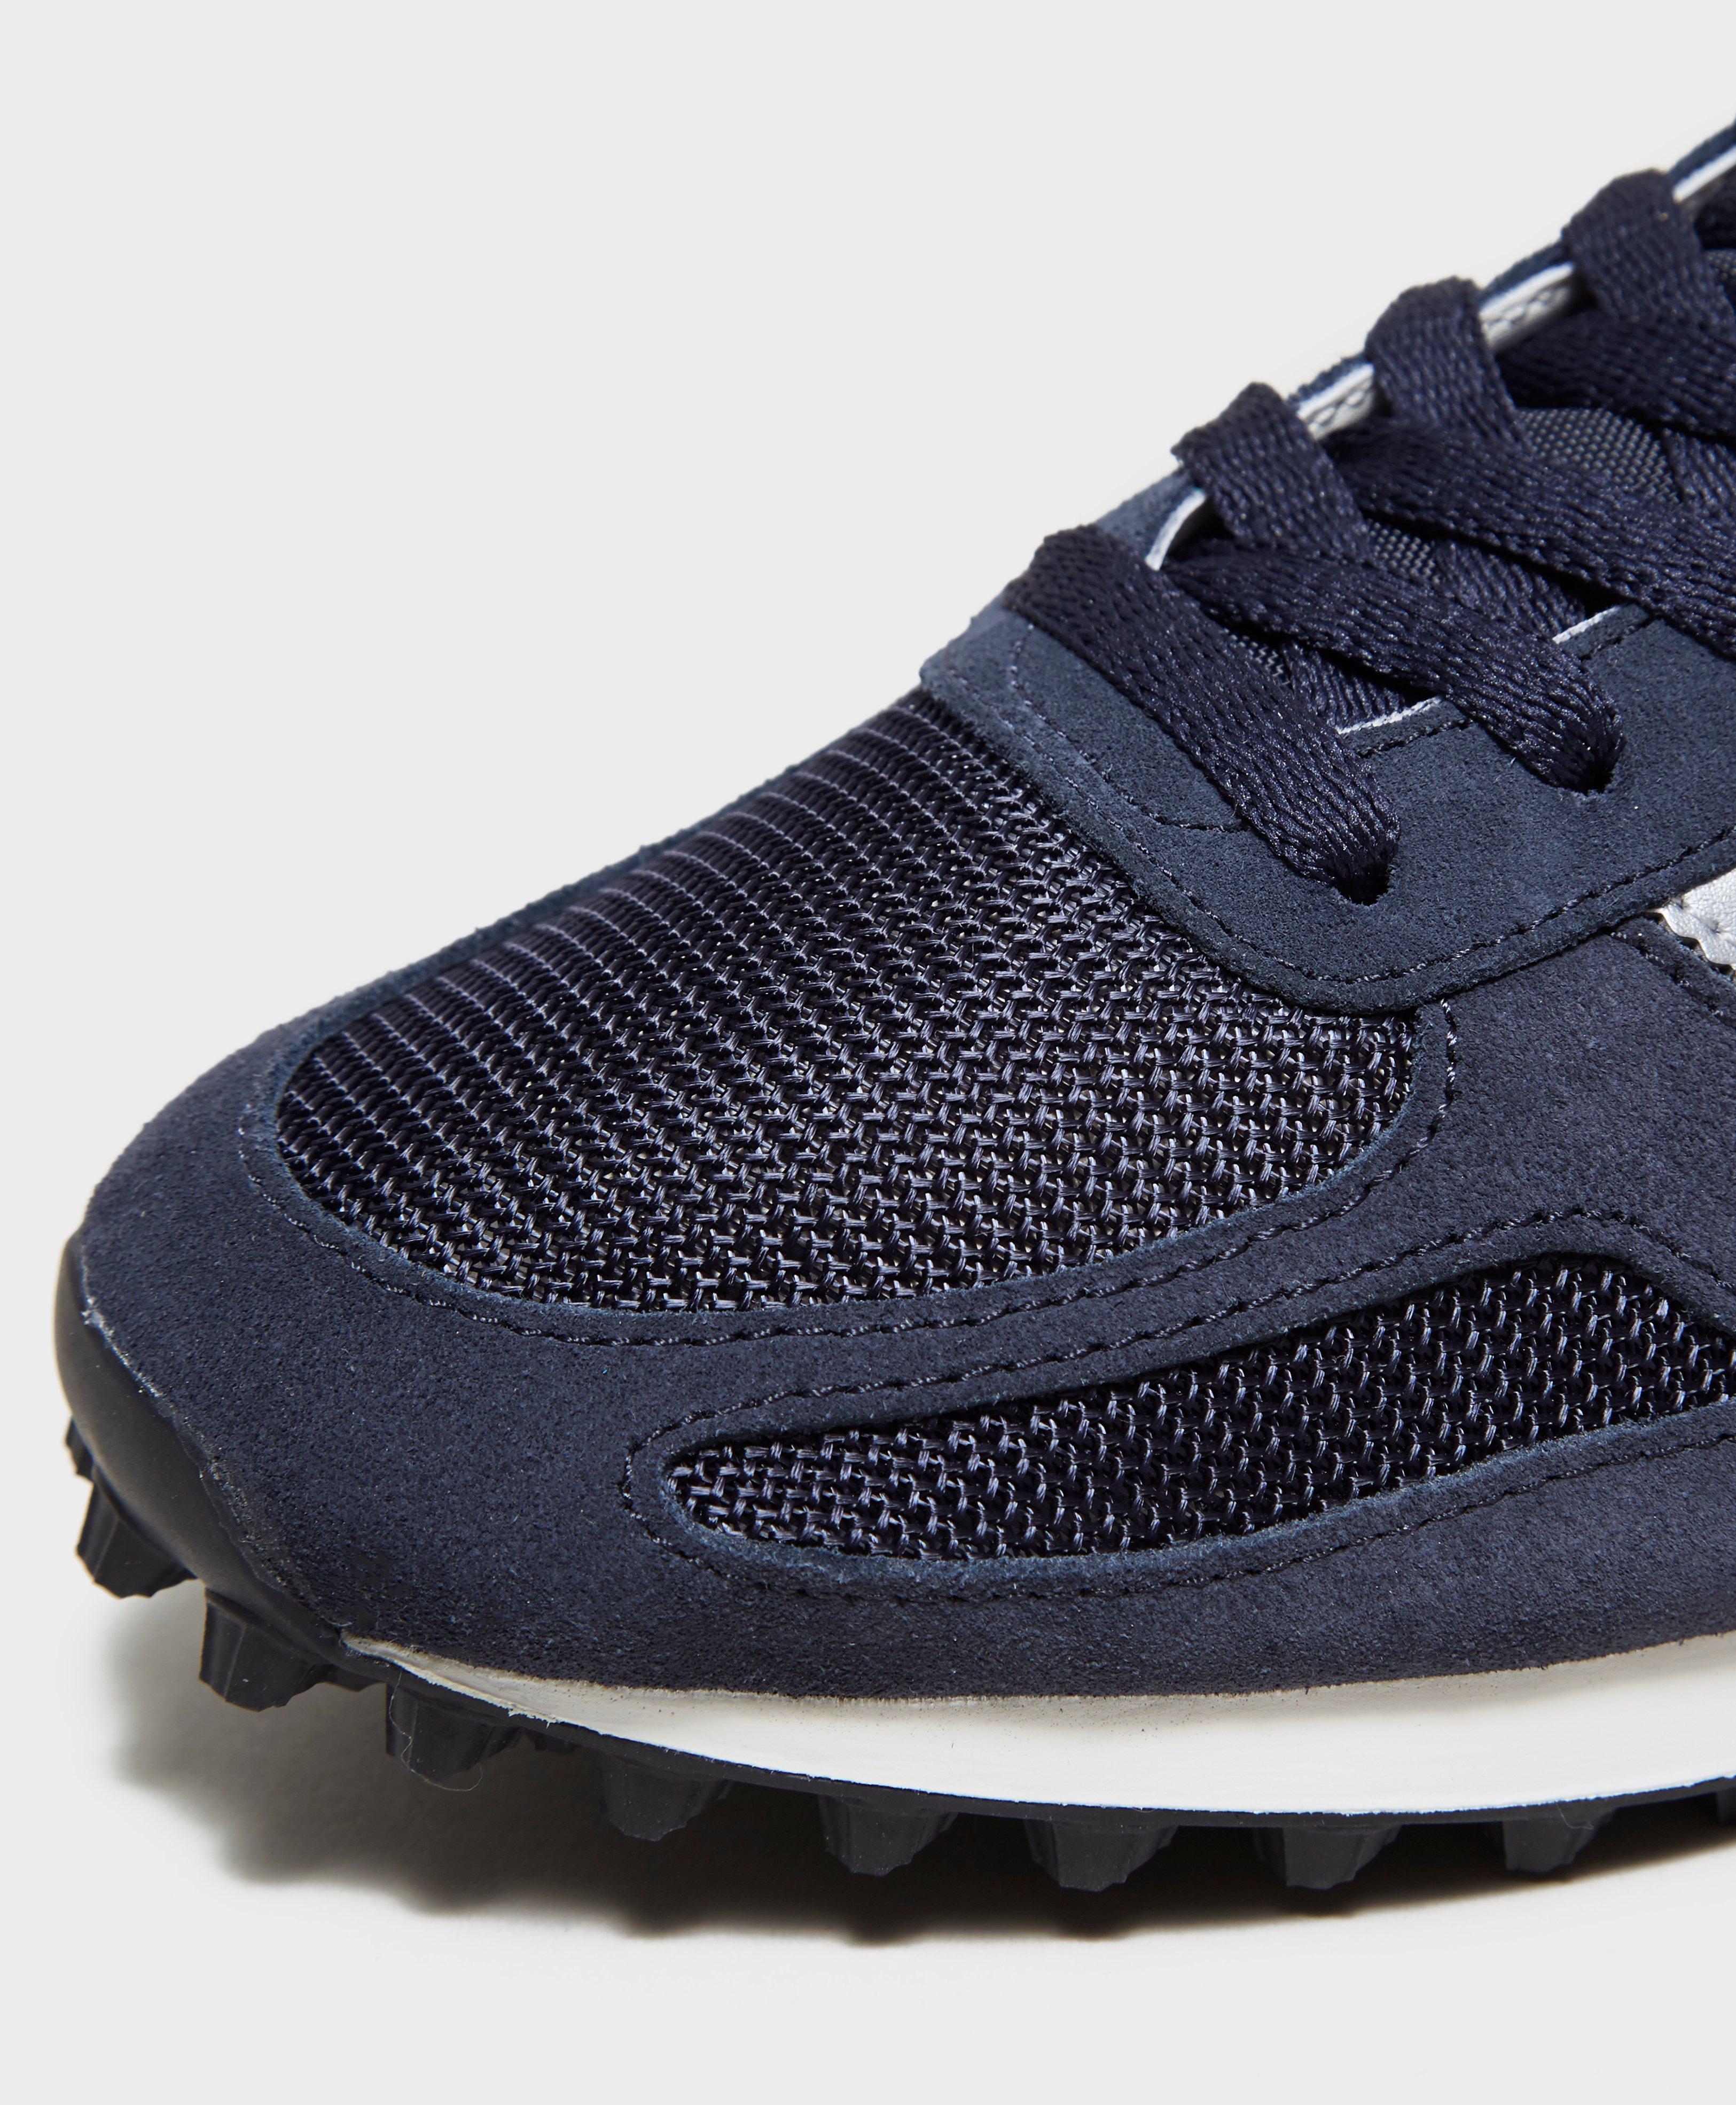 Adidas Hombres NMD XR1 Primeknit PK Glitch Camuflaje